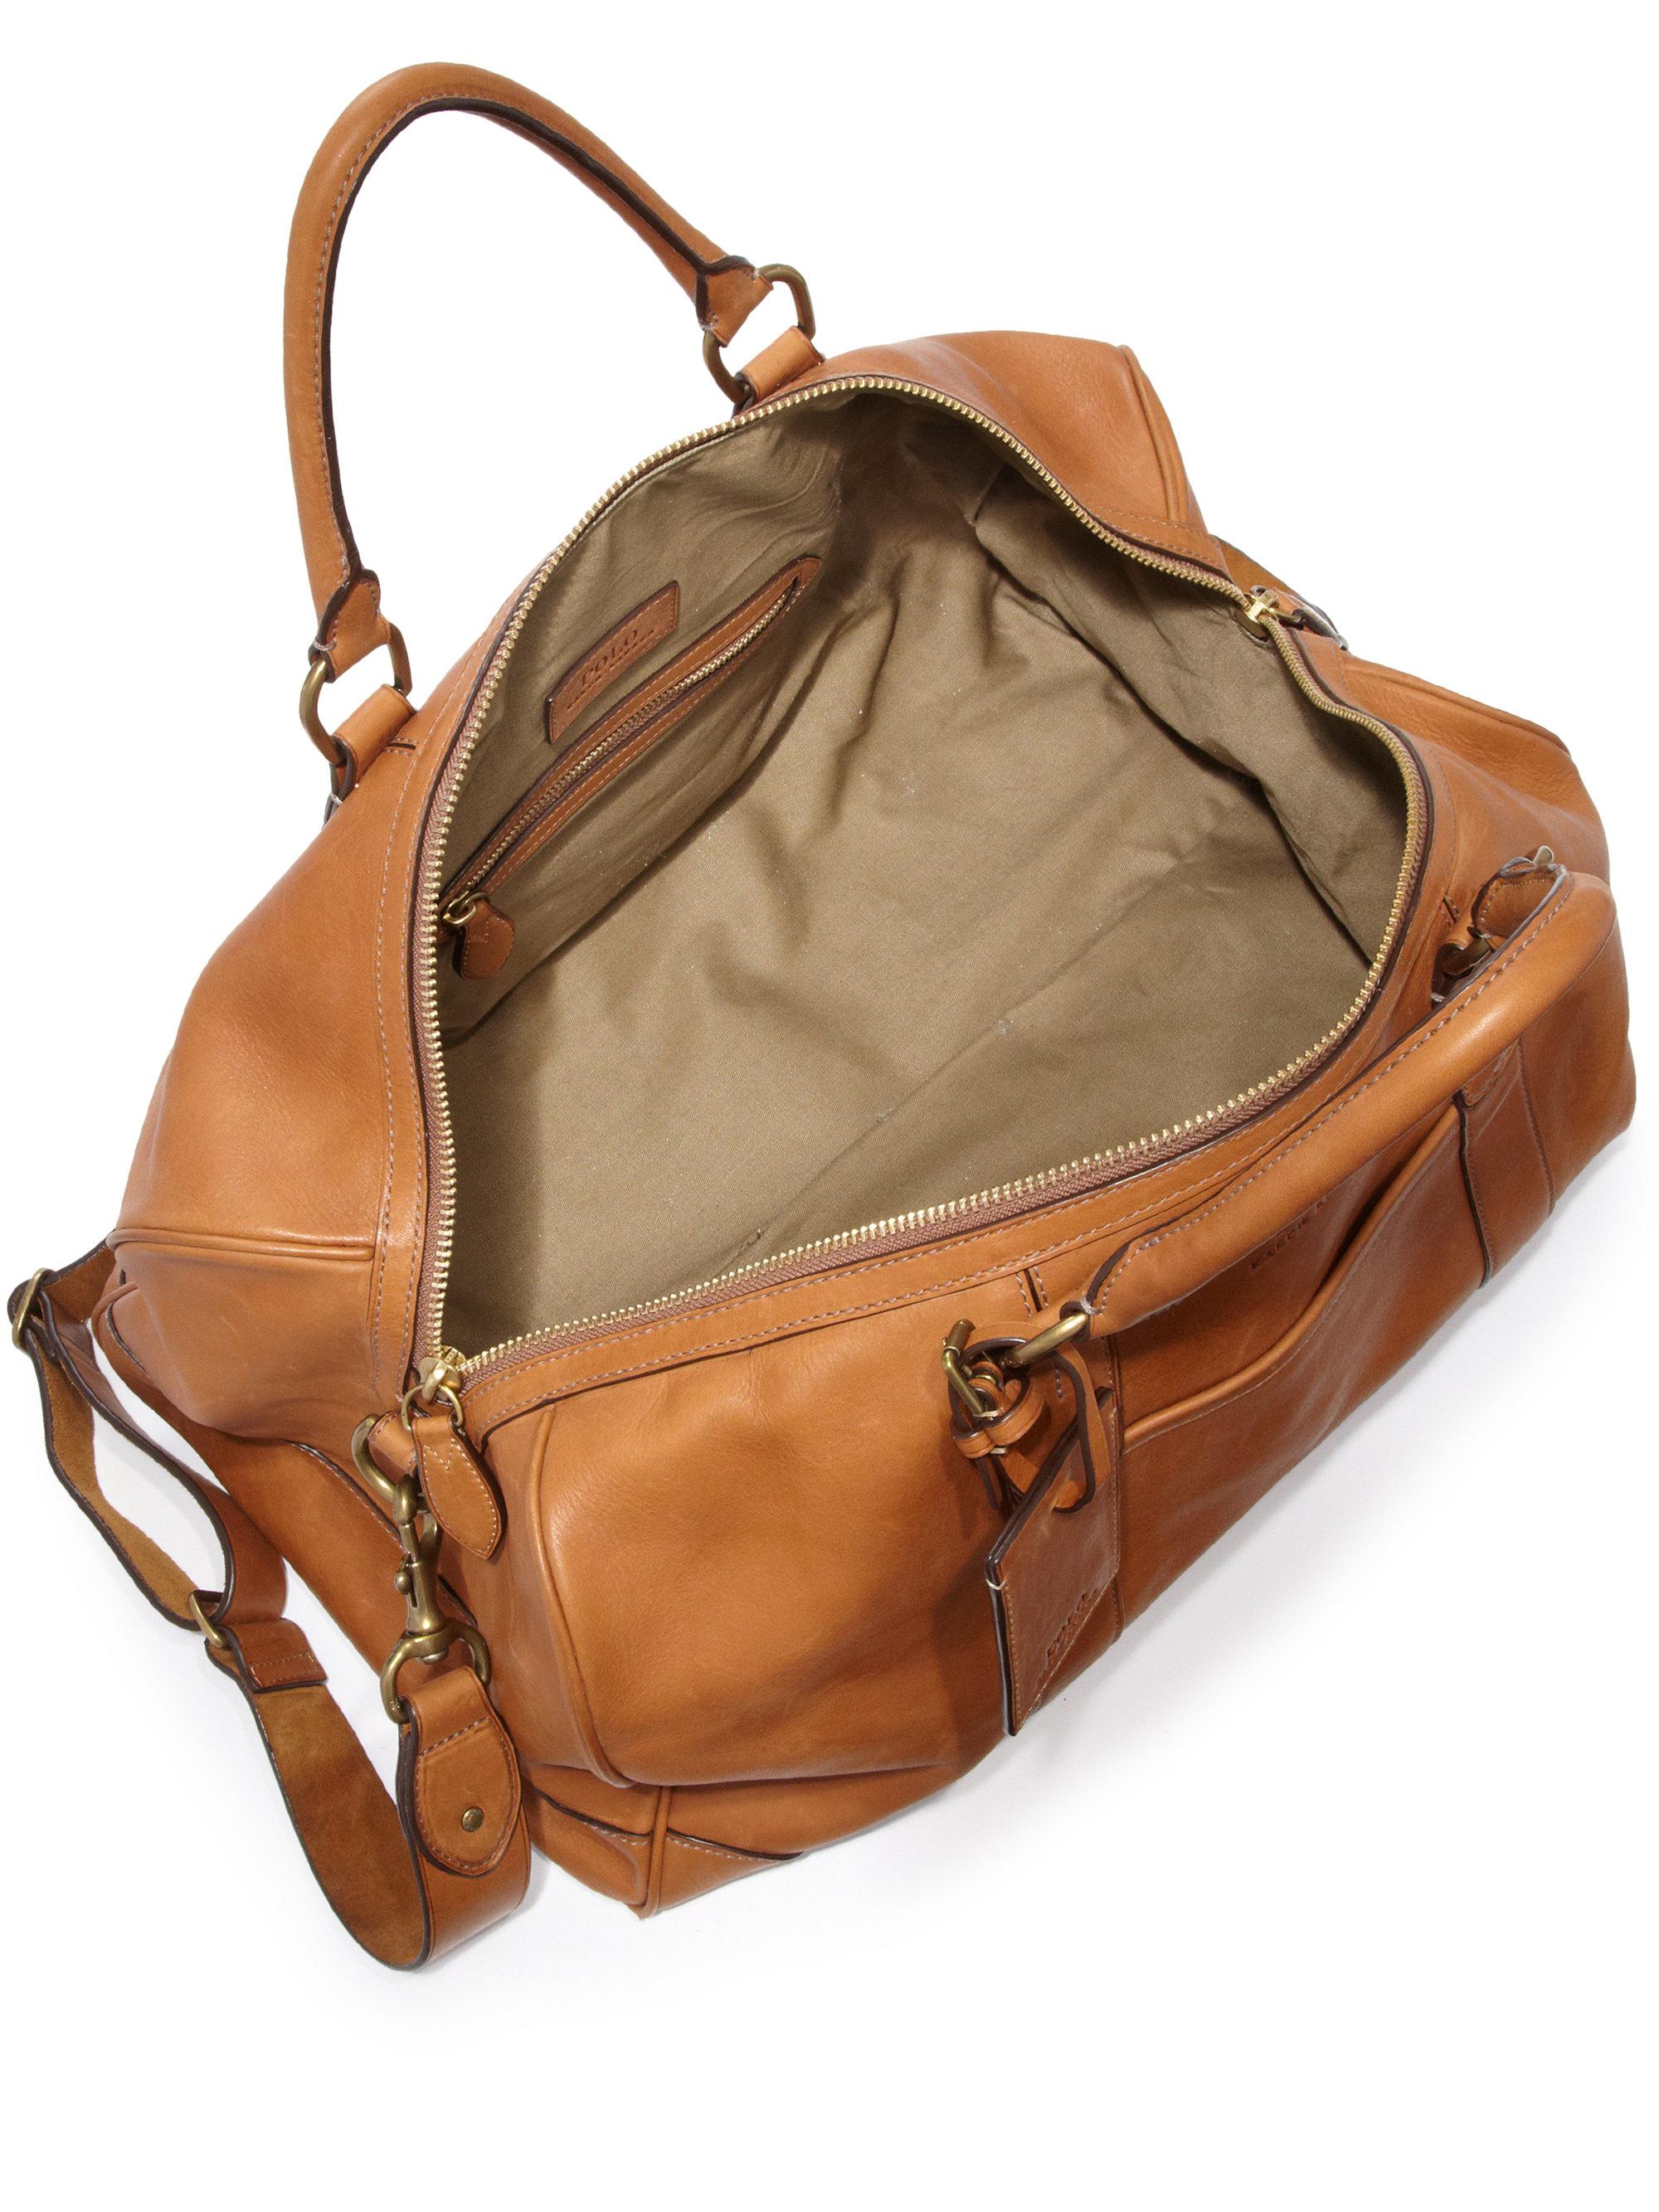 Polo Ralph Lauren | Brown Leather Duffel Bag for Men | Lyst. View Fullscreen